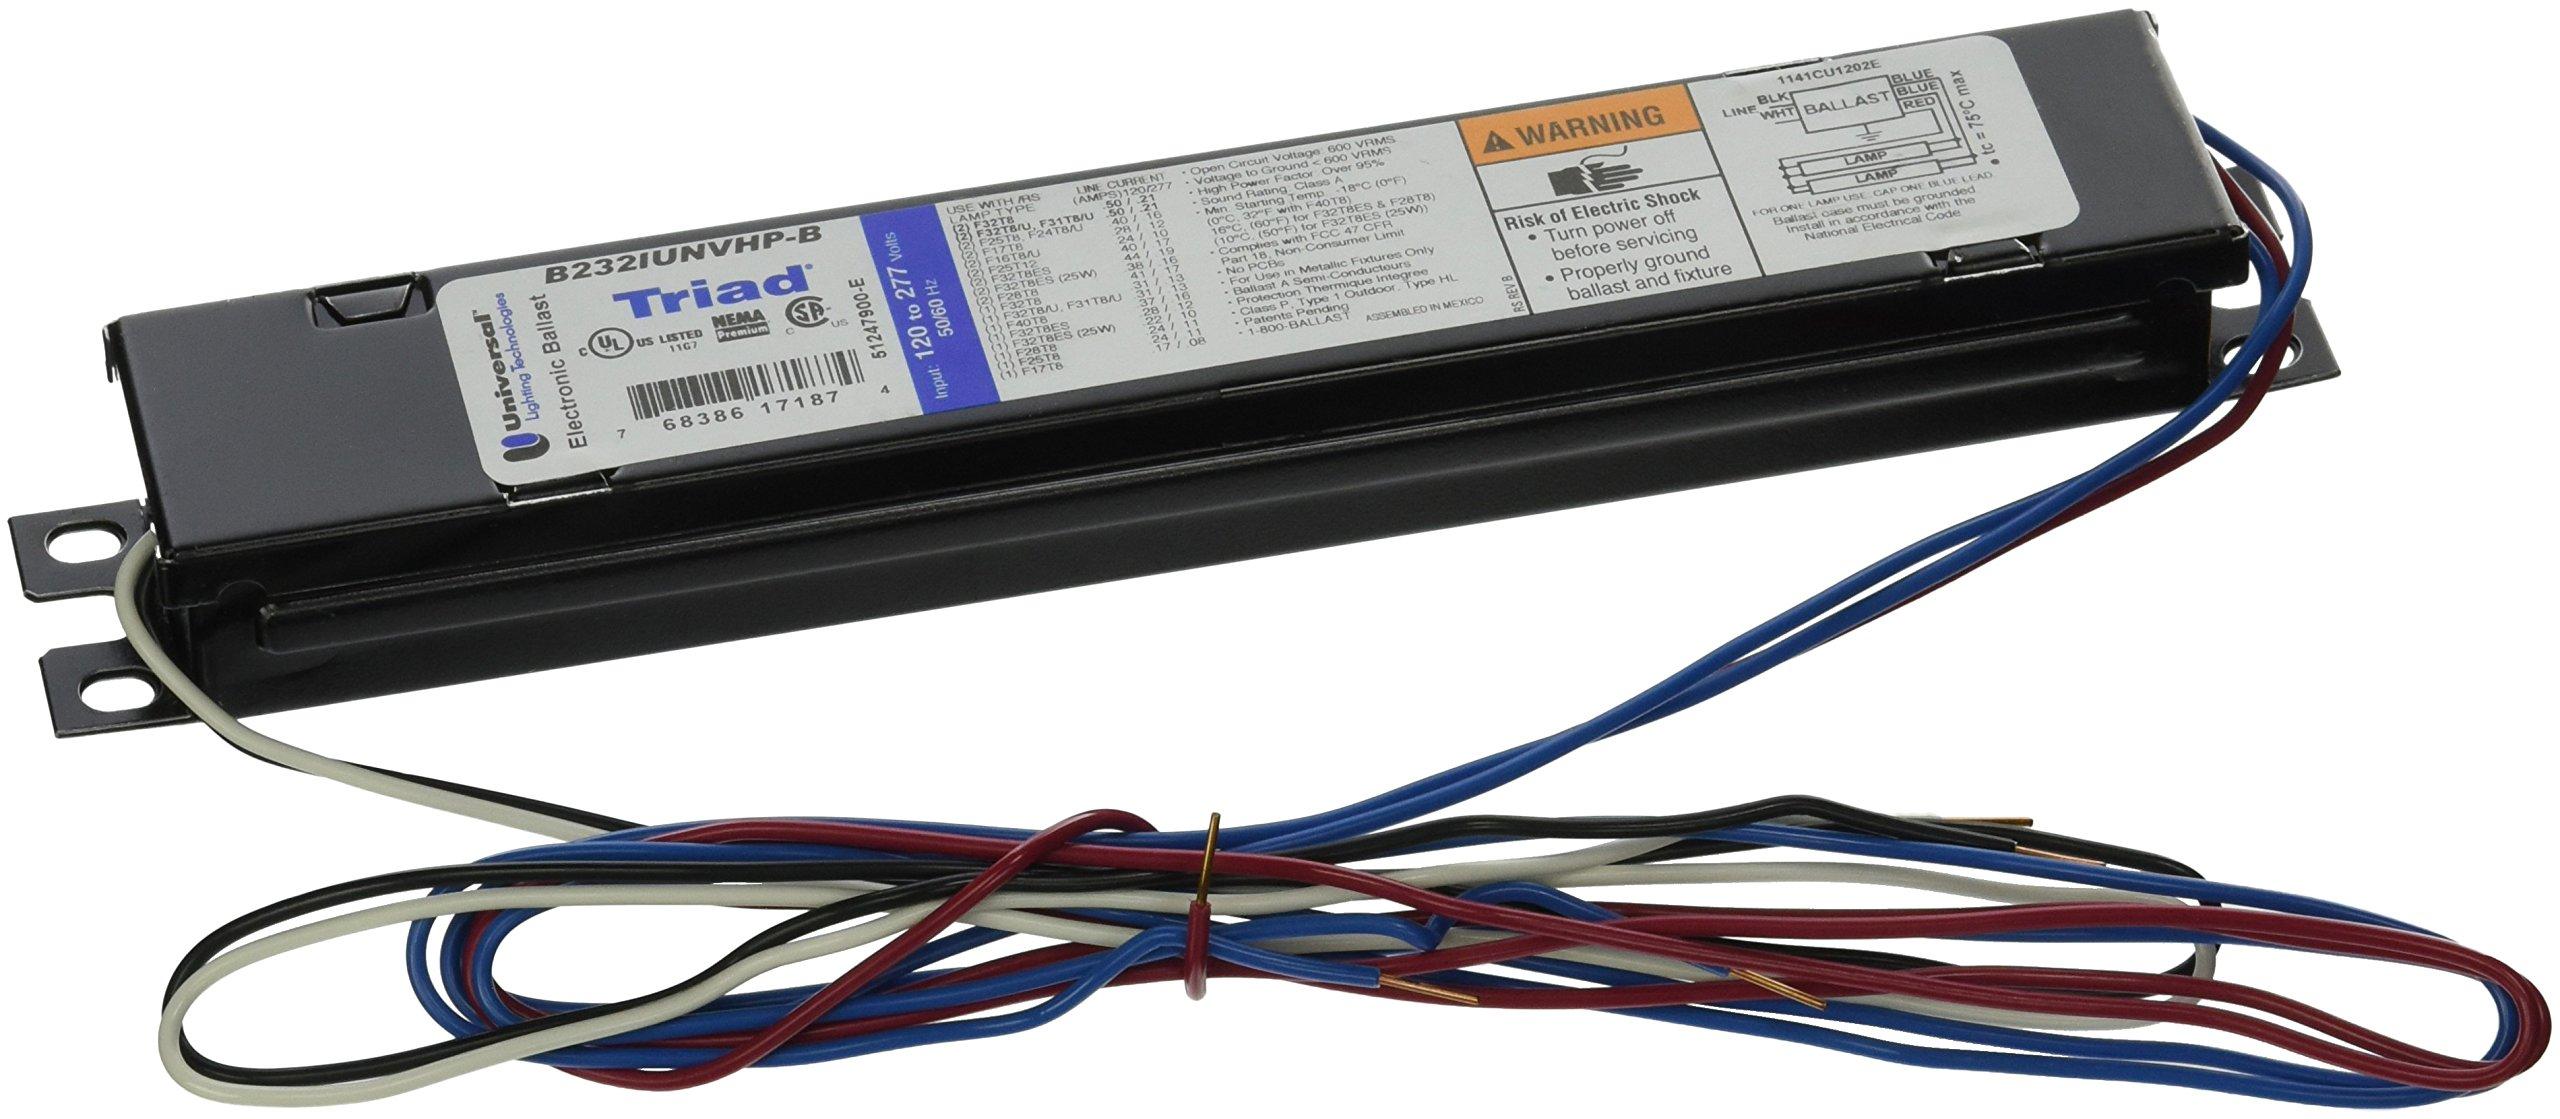 Universal Lighting Technologies B232IUNVHP-B Electronics Fluorescent Ballast